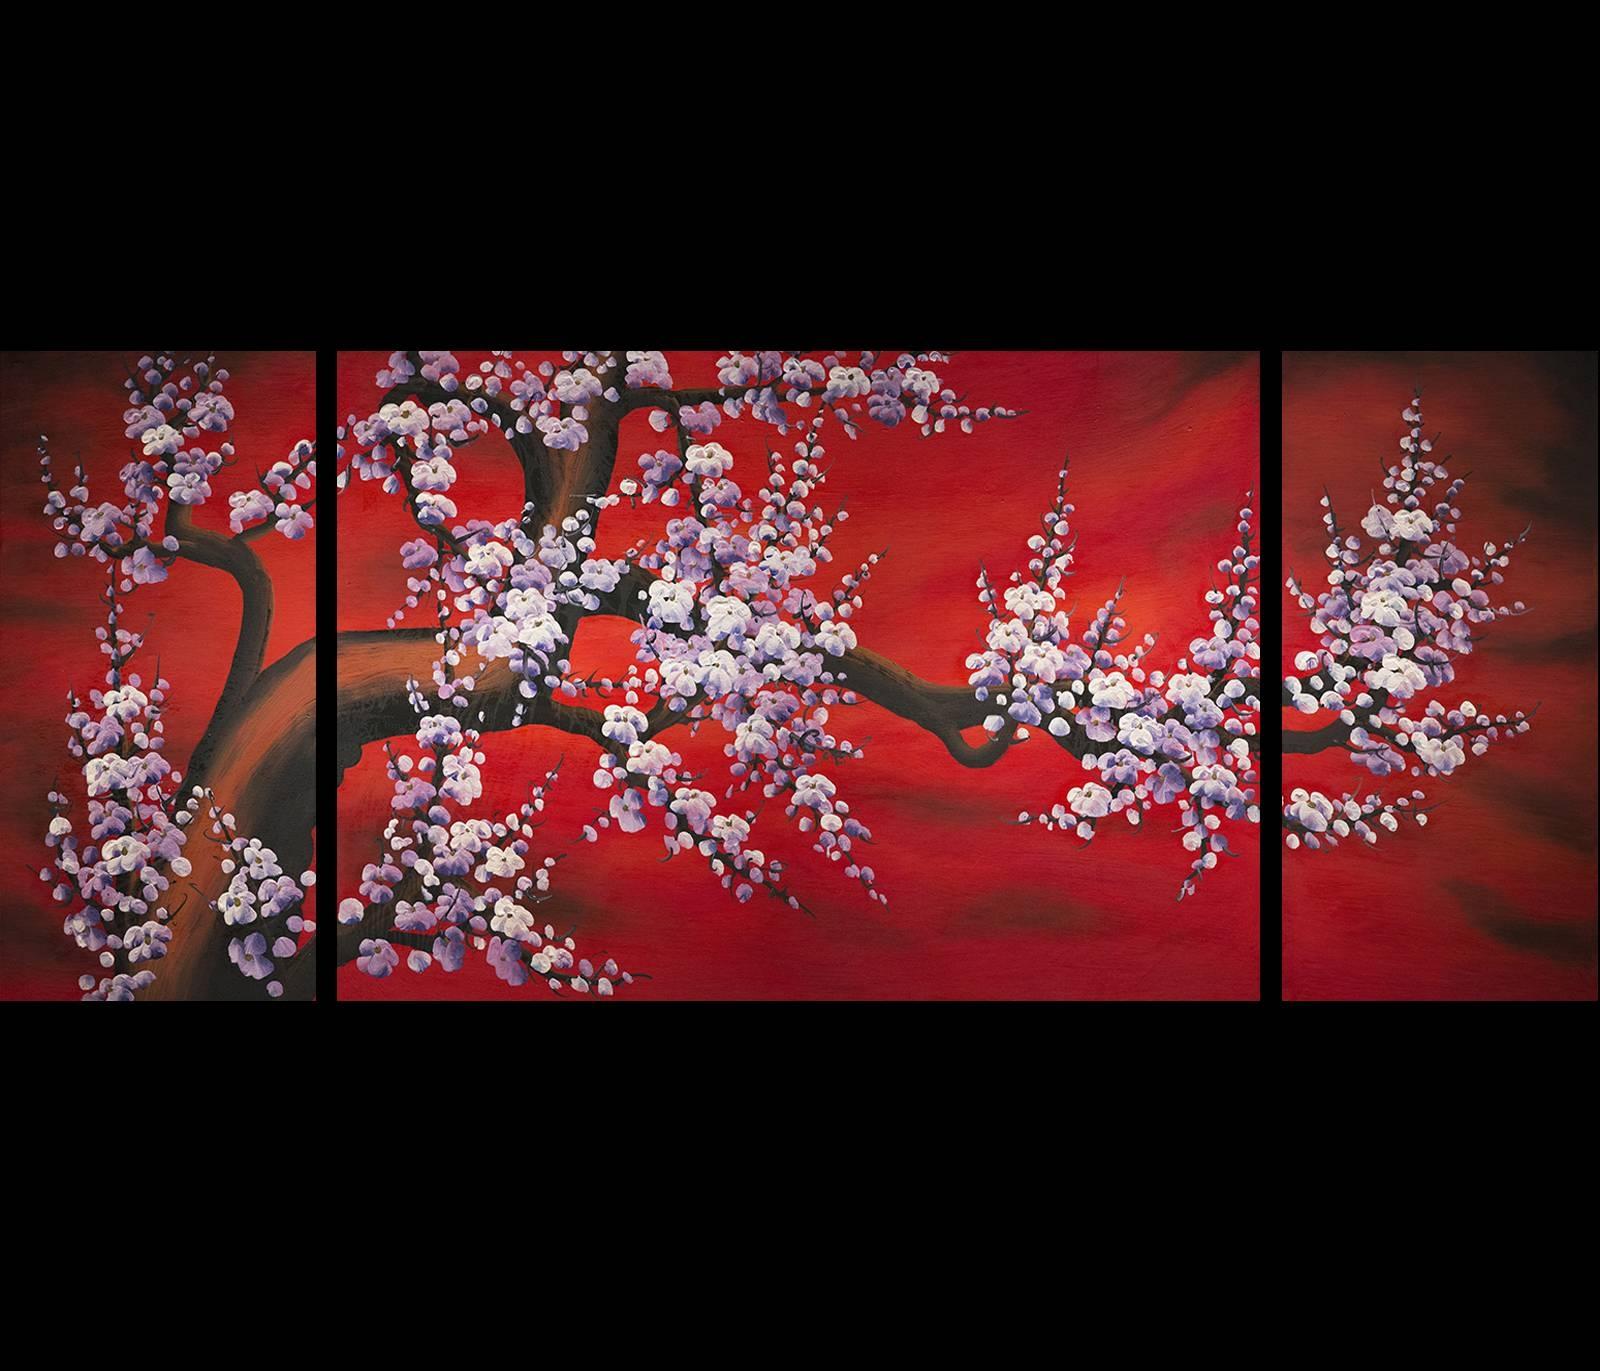 Wall Art Design Ideas: Minimalist House Chinese Wall Art Painting Inside Latest Chinese Symbol Wall Art (View 20 of 30)